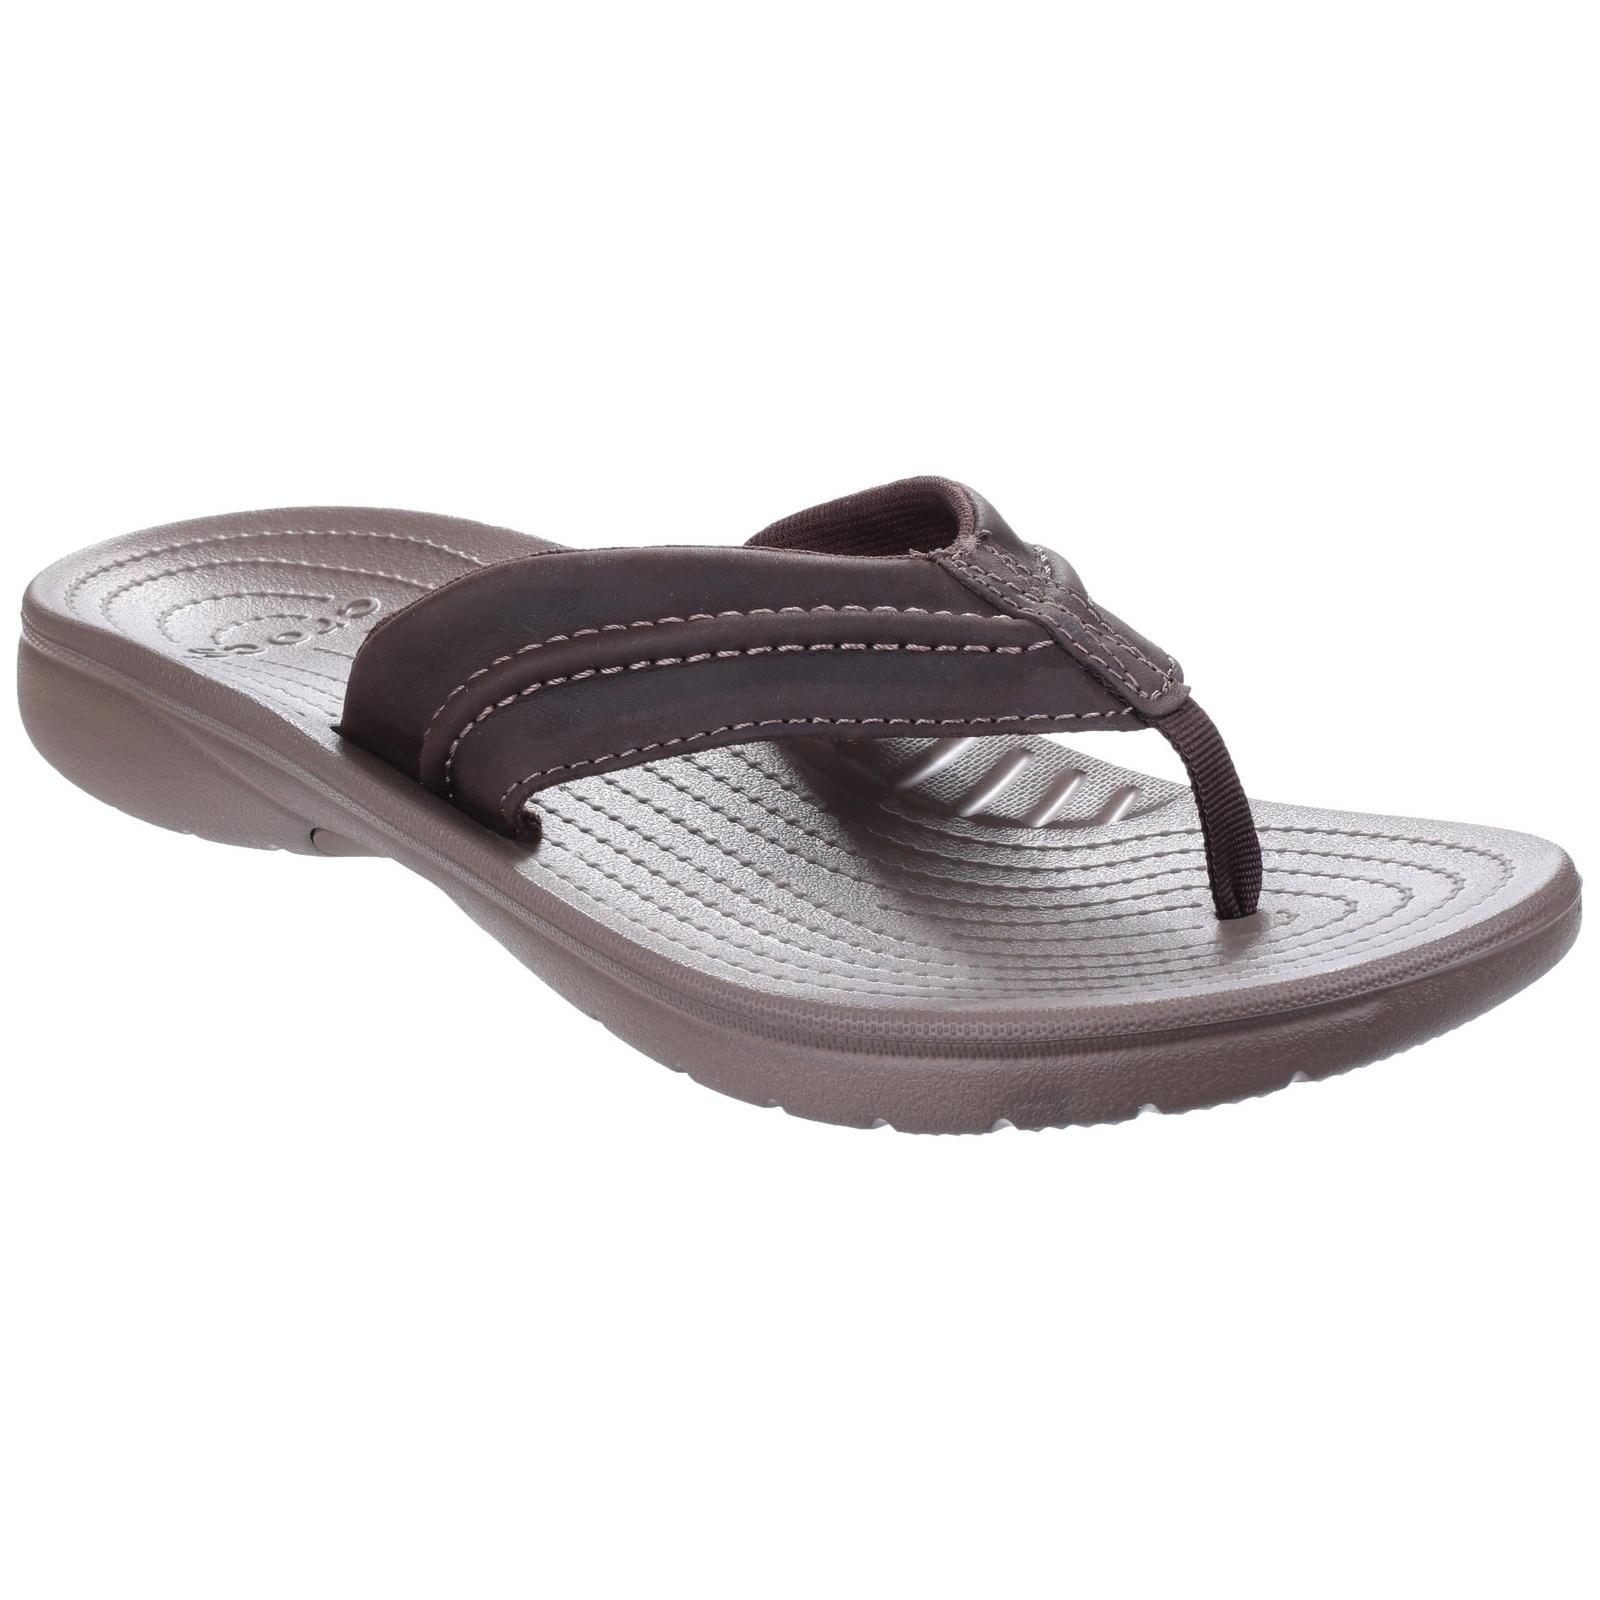 crocs mens yukon mesa summer toe post flip flops sandals. Black Bedroom Furniture Sets. Home Design Ideas